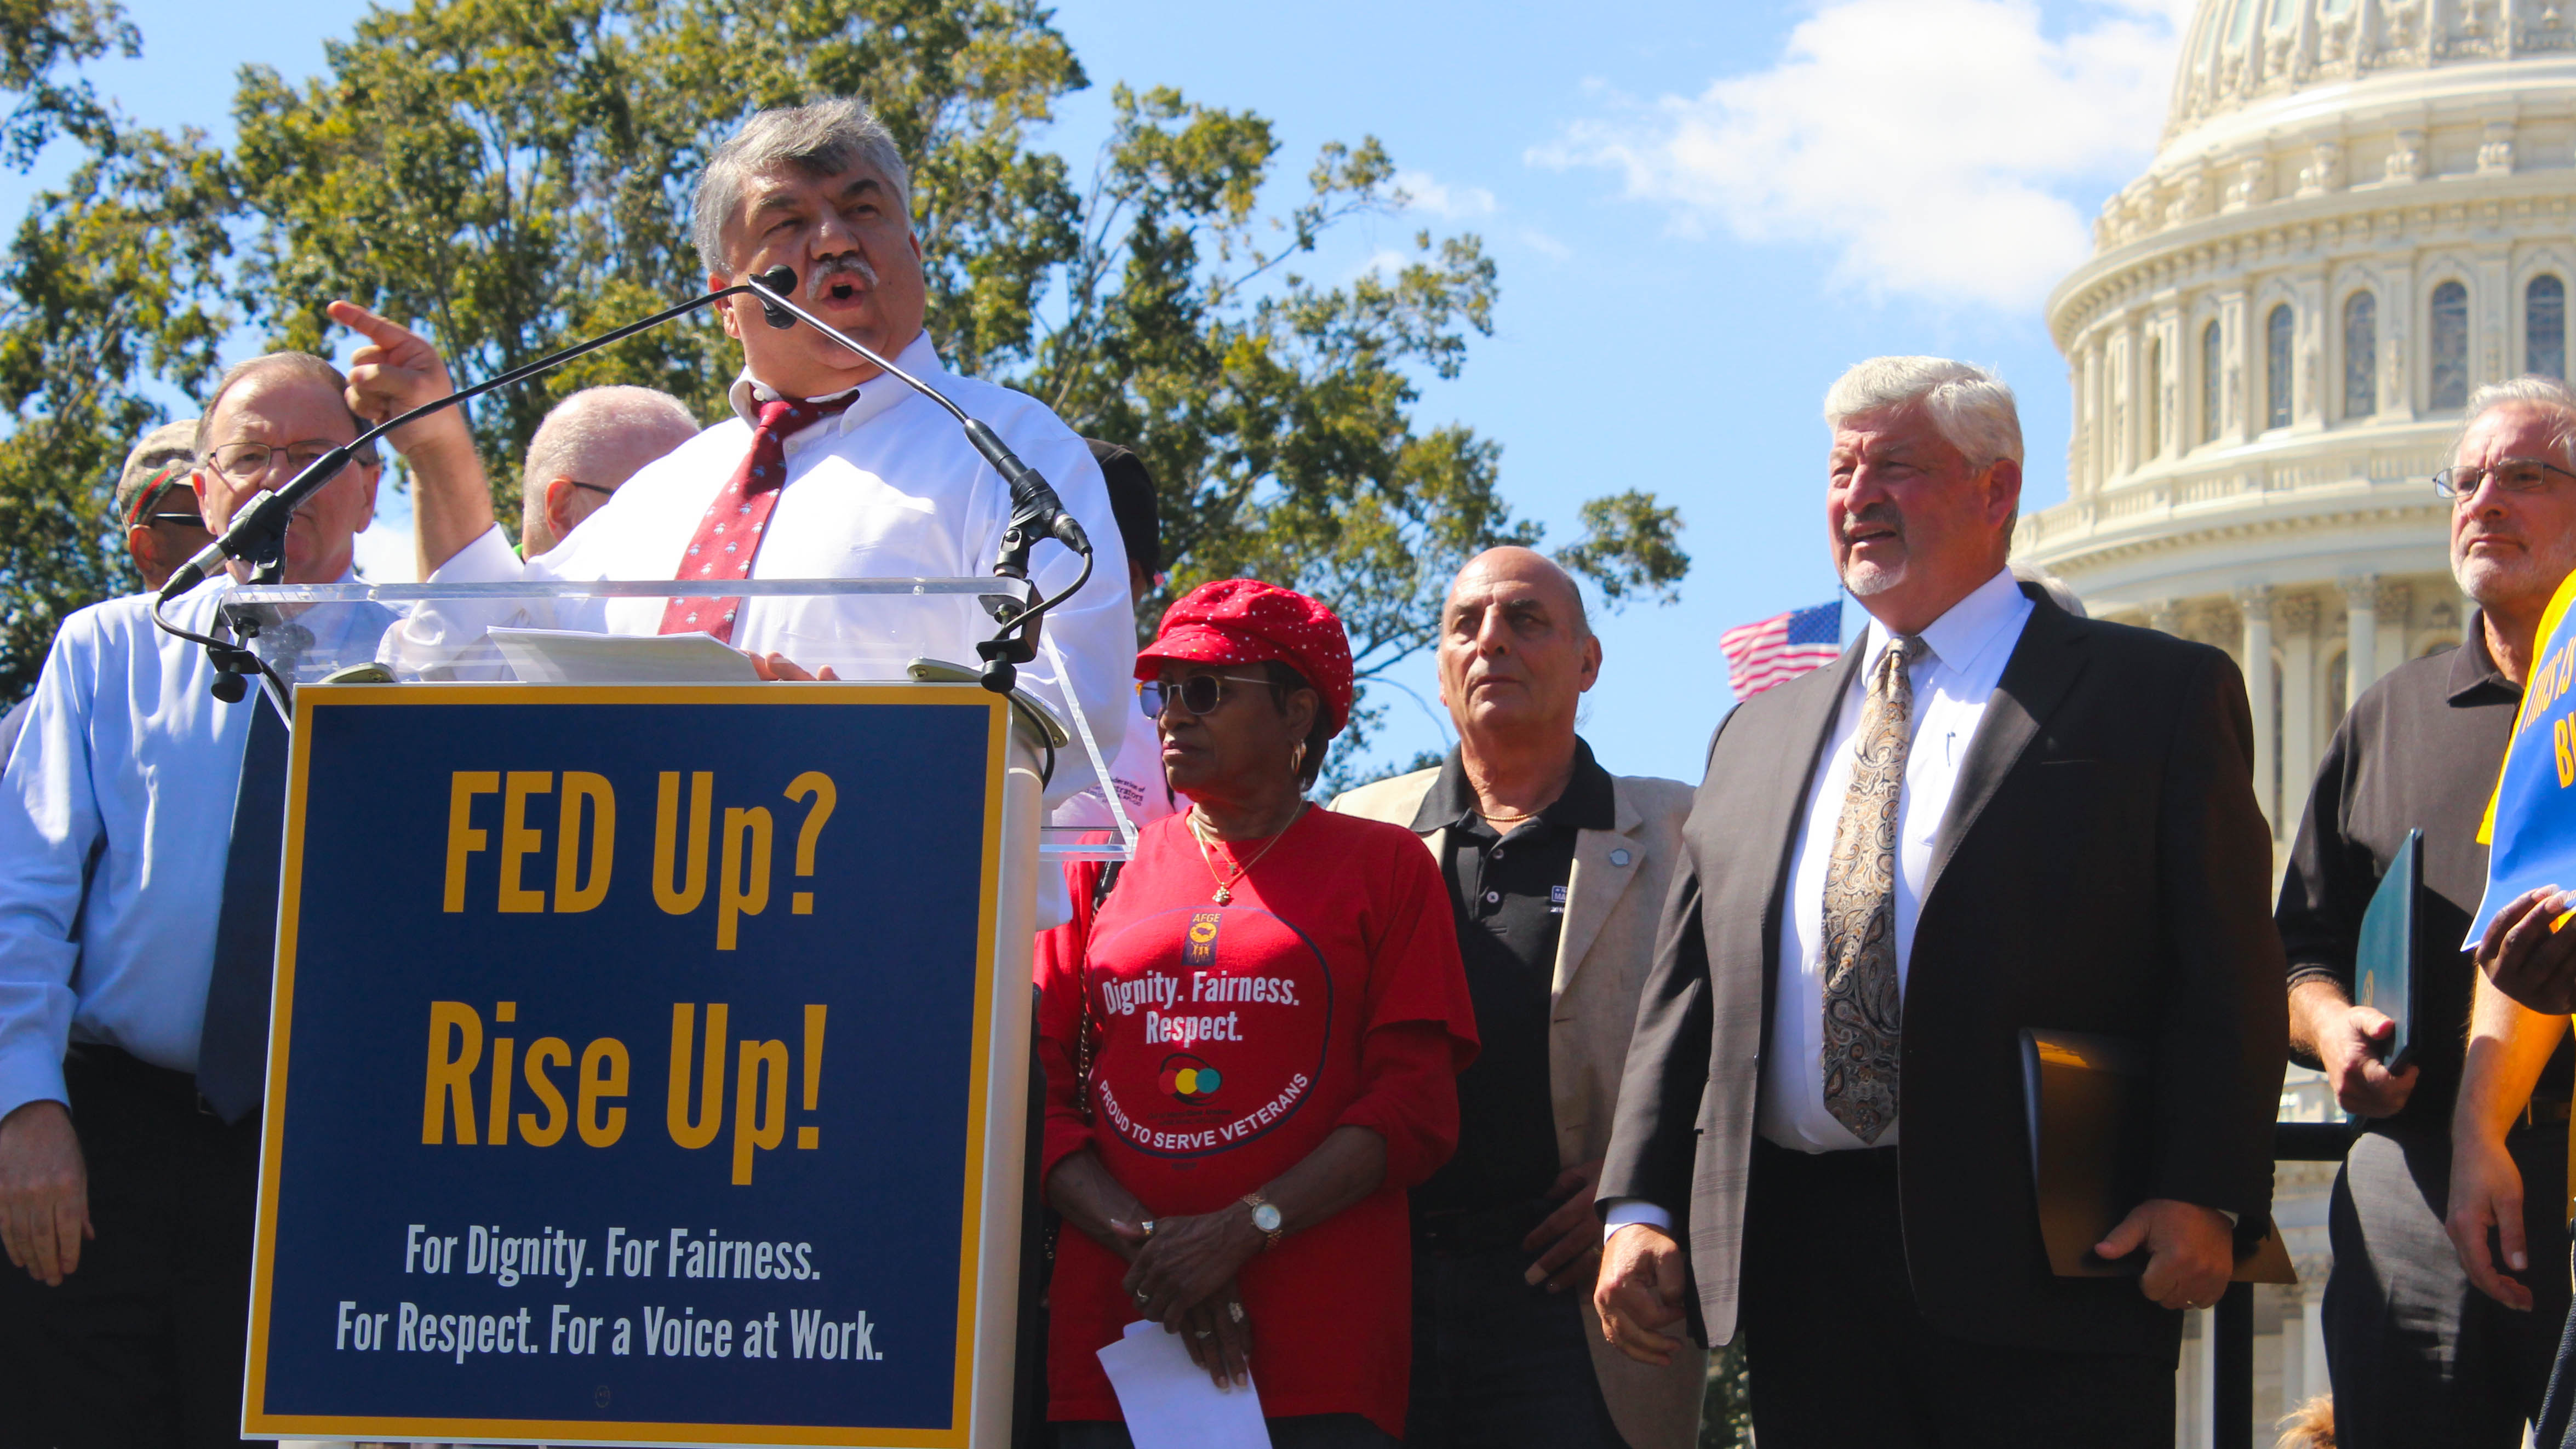 AFL-CIO President Richard Trumka speaks to union protesters outside the U.S. Capitol building. (Jessie Bur/Staff)